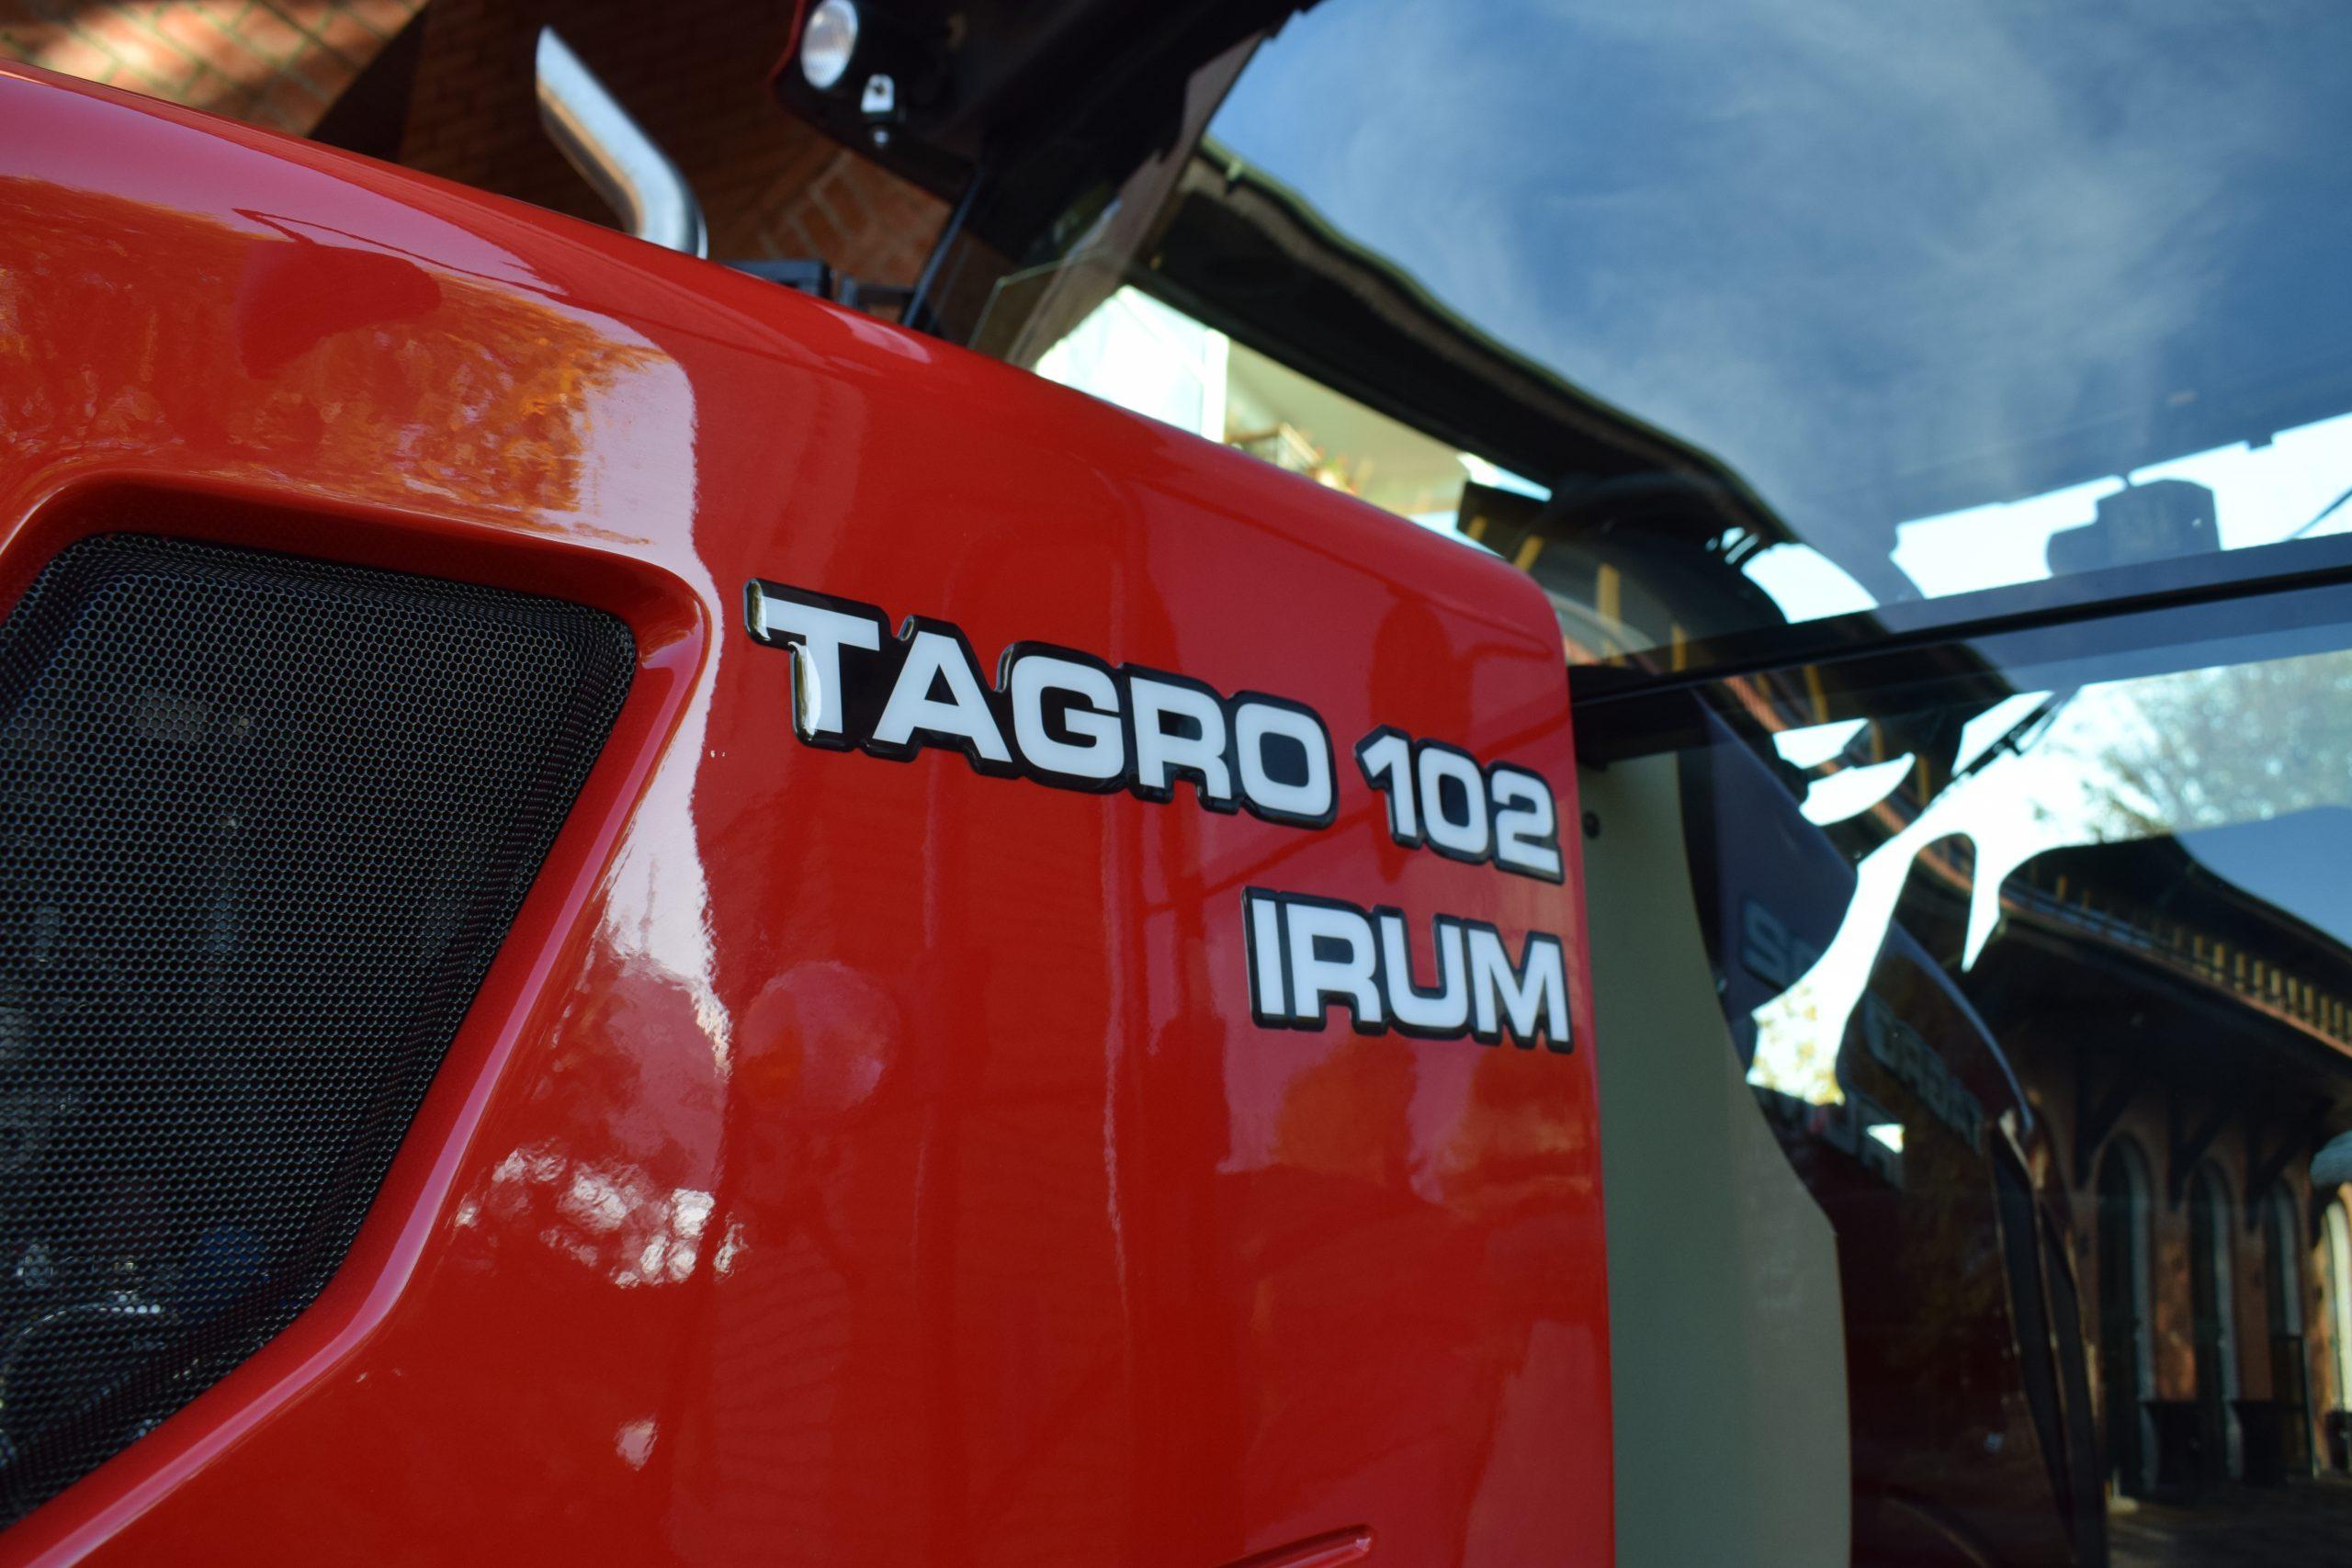 Tractor romanesc Tagro Irum nume